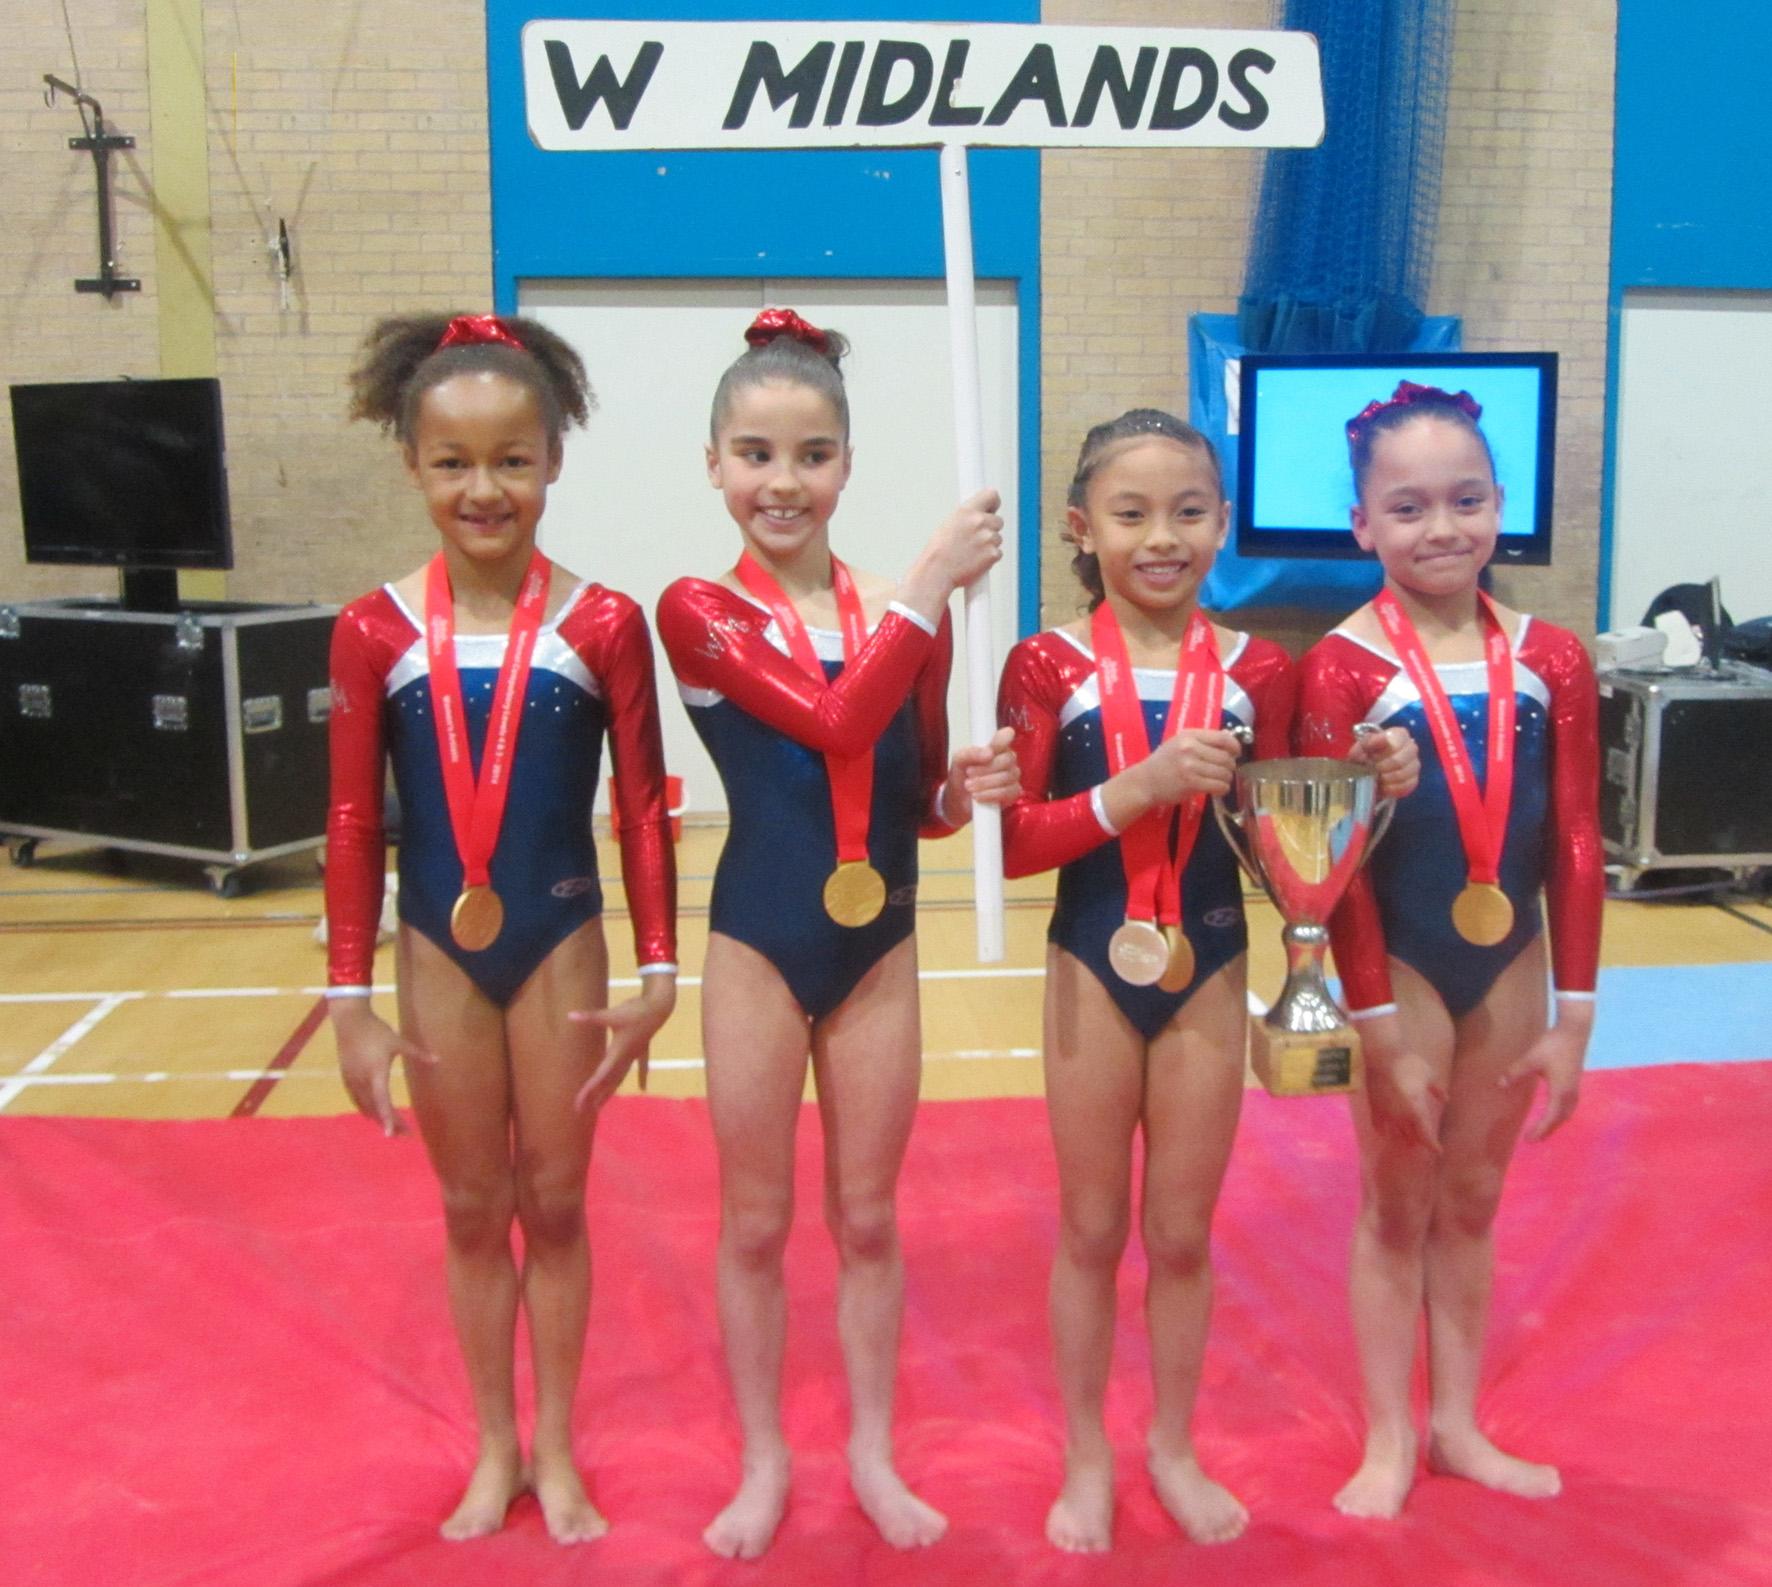 Miriam, Amelia, Sophia C, Sophia M - West Midlands L4 Team